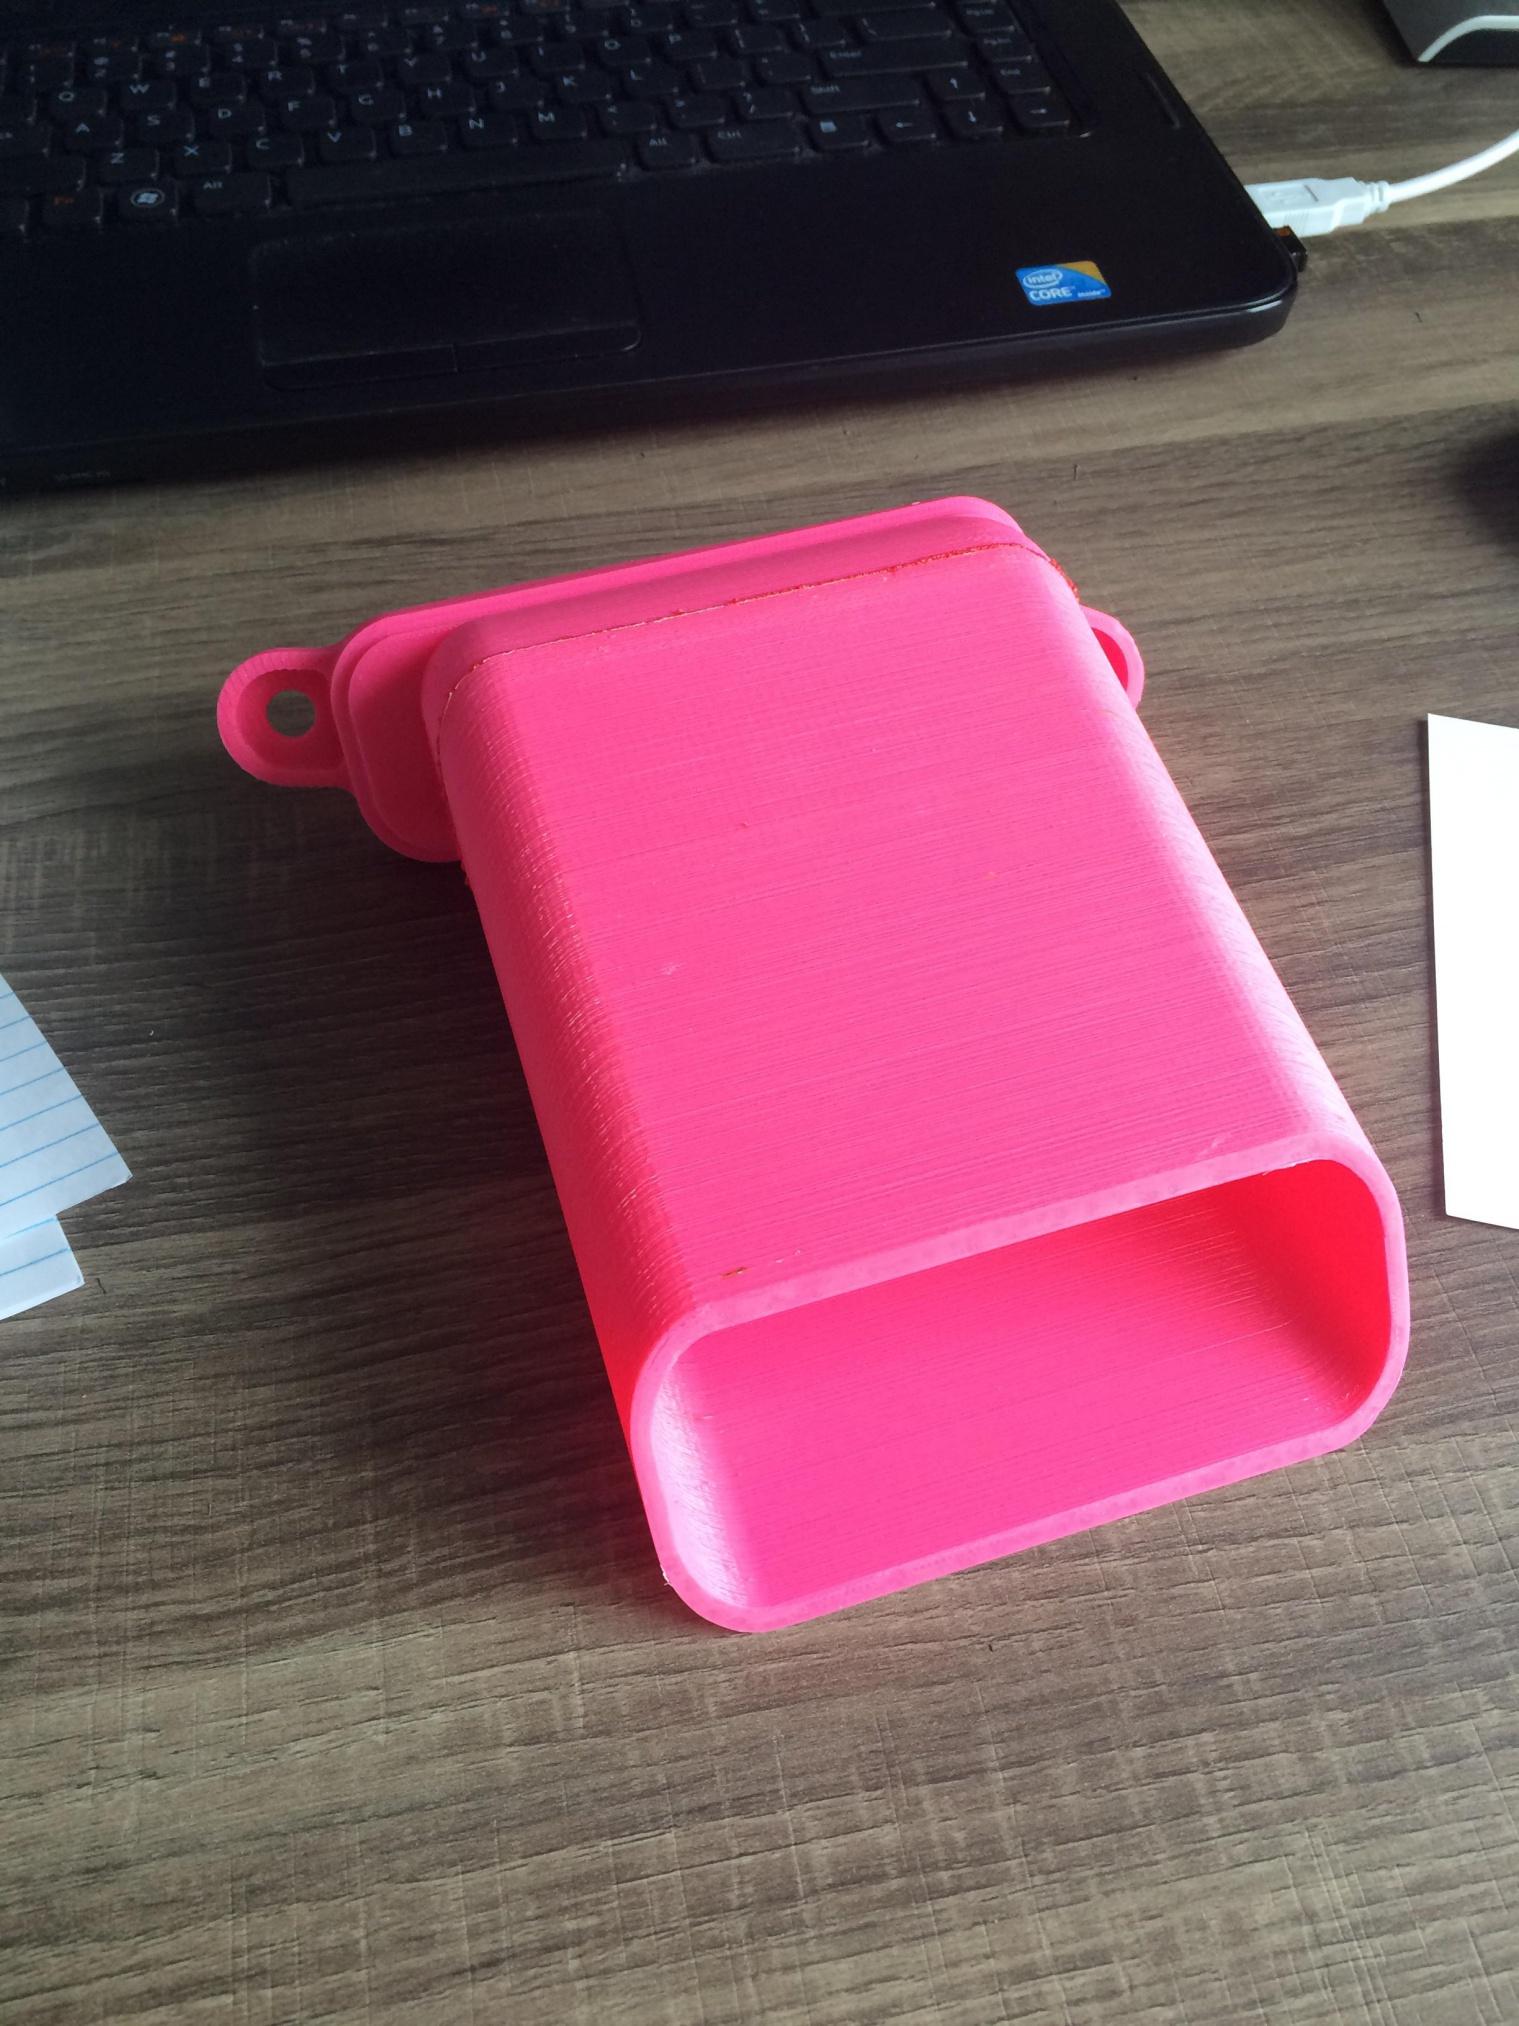 3D printer on standby (snorkel)-img_2977_1497898979073.jpg